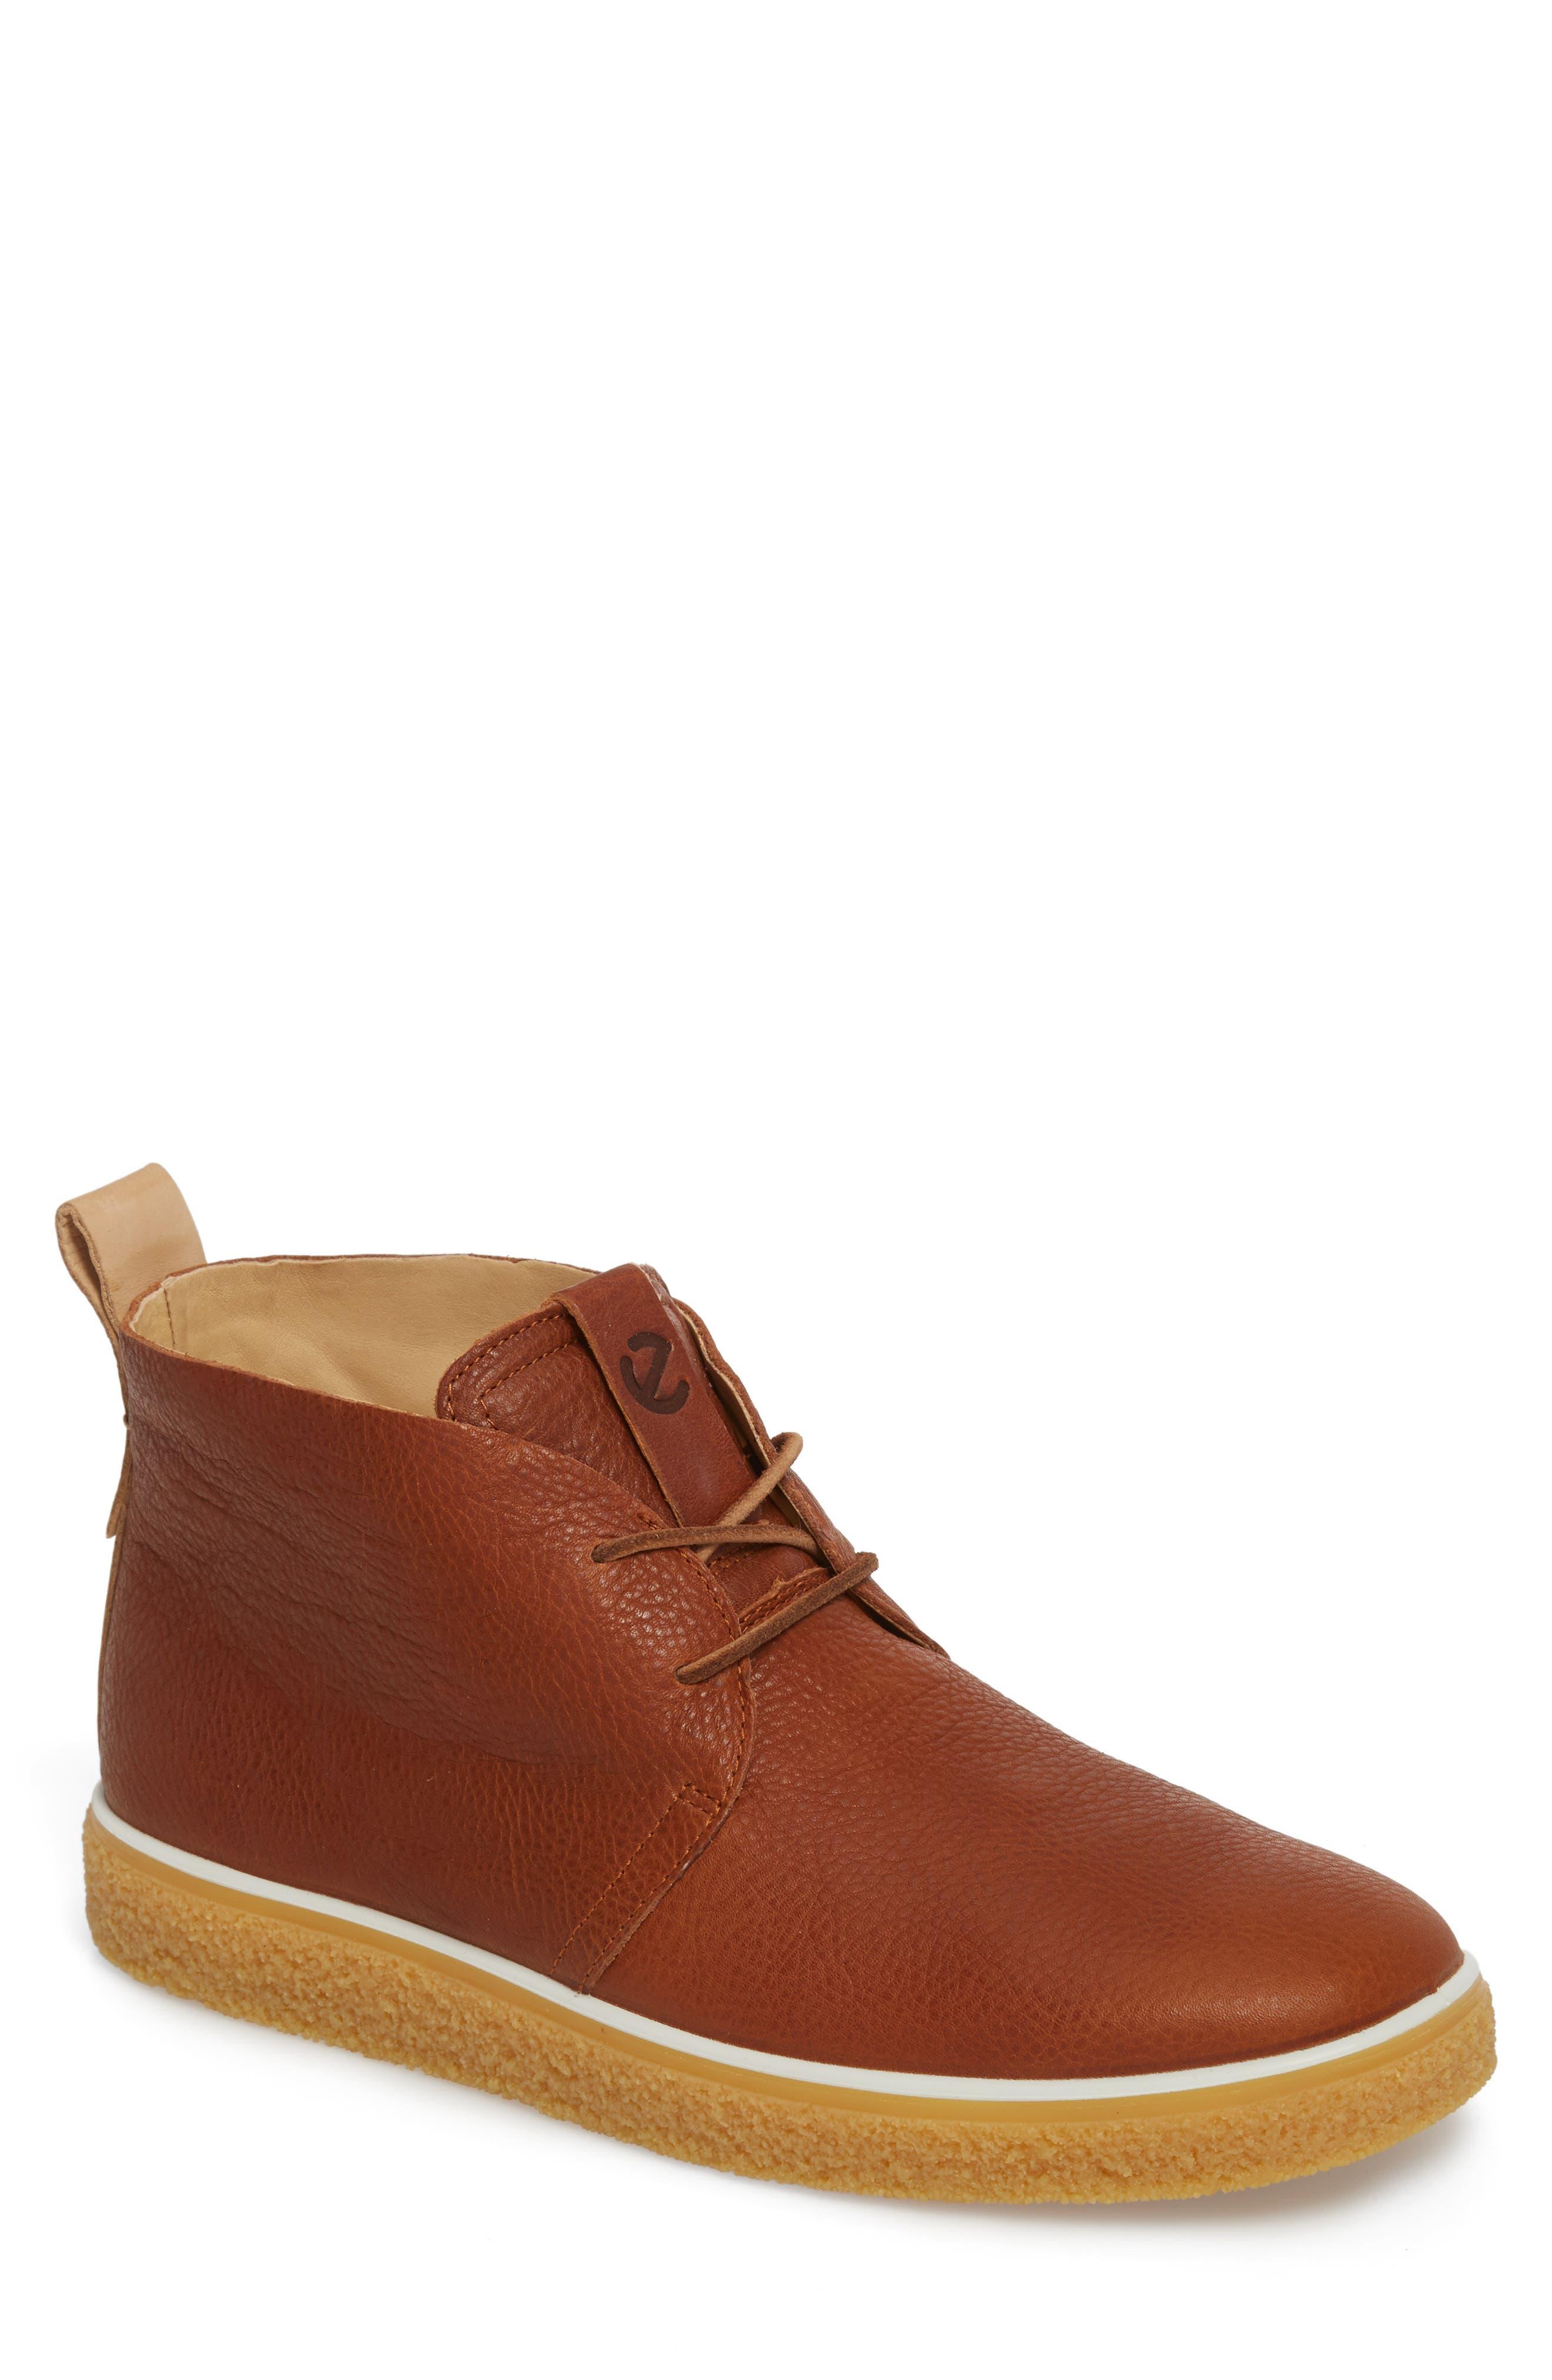 Crepetray Chukka Boot,                             Main thumbnail 1, color,                             Lion Leather